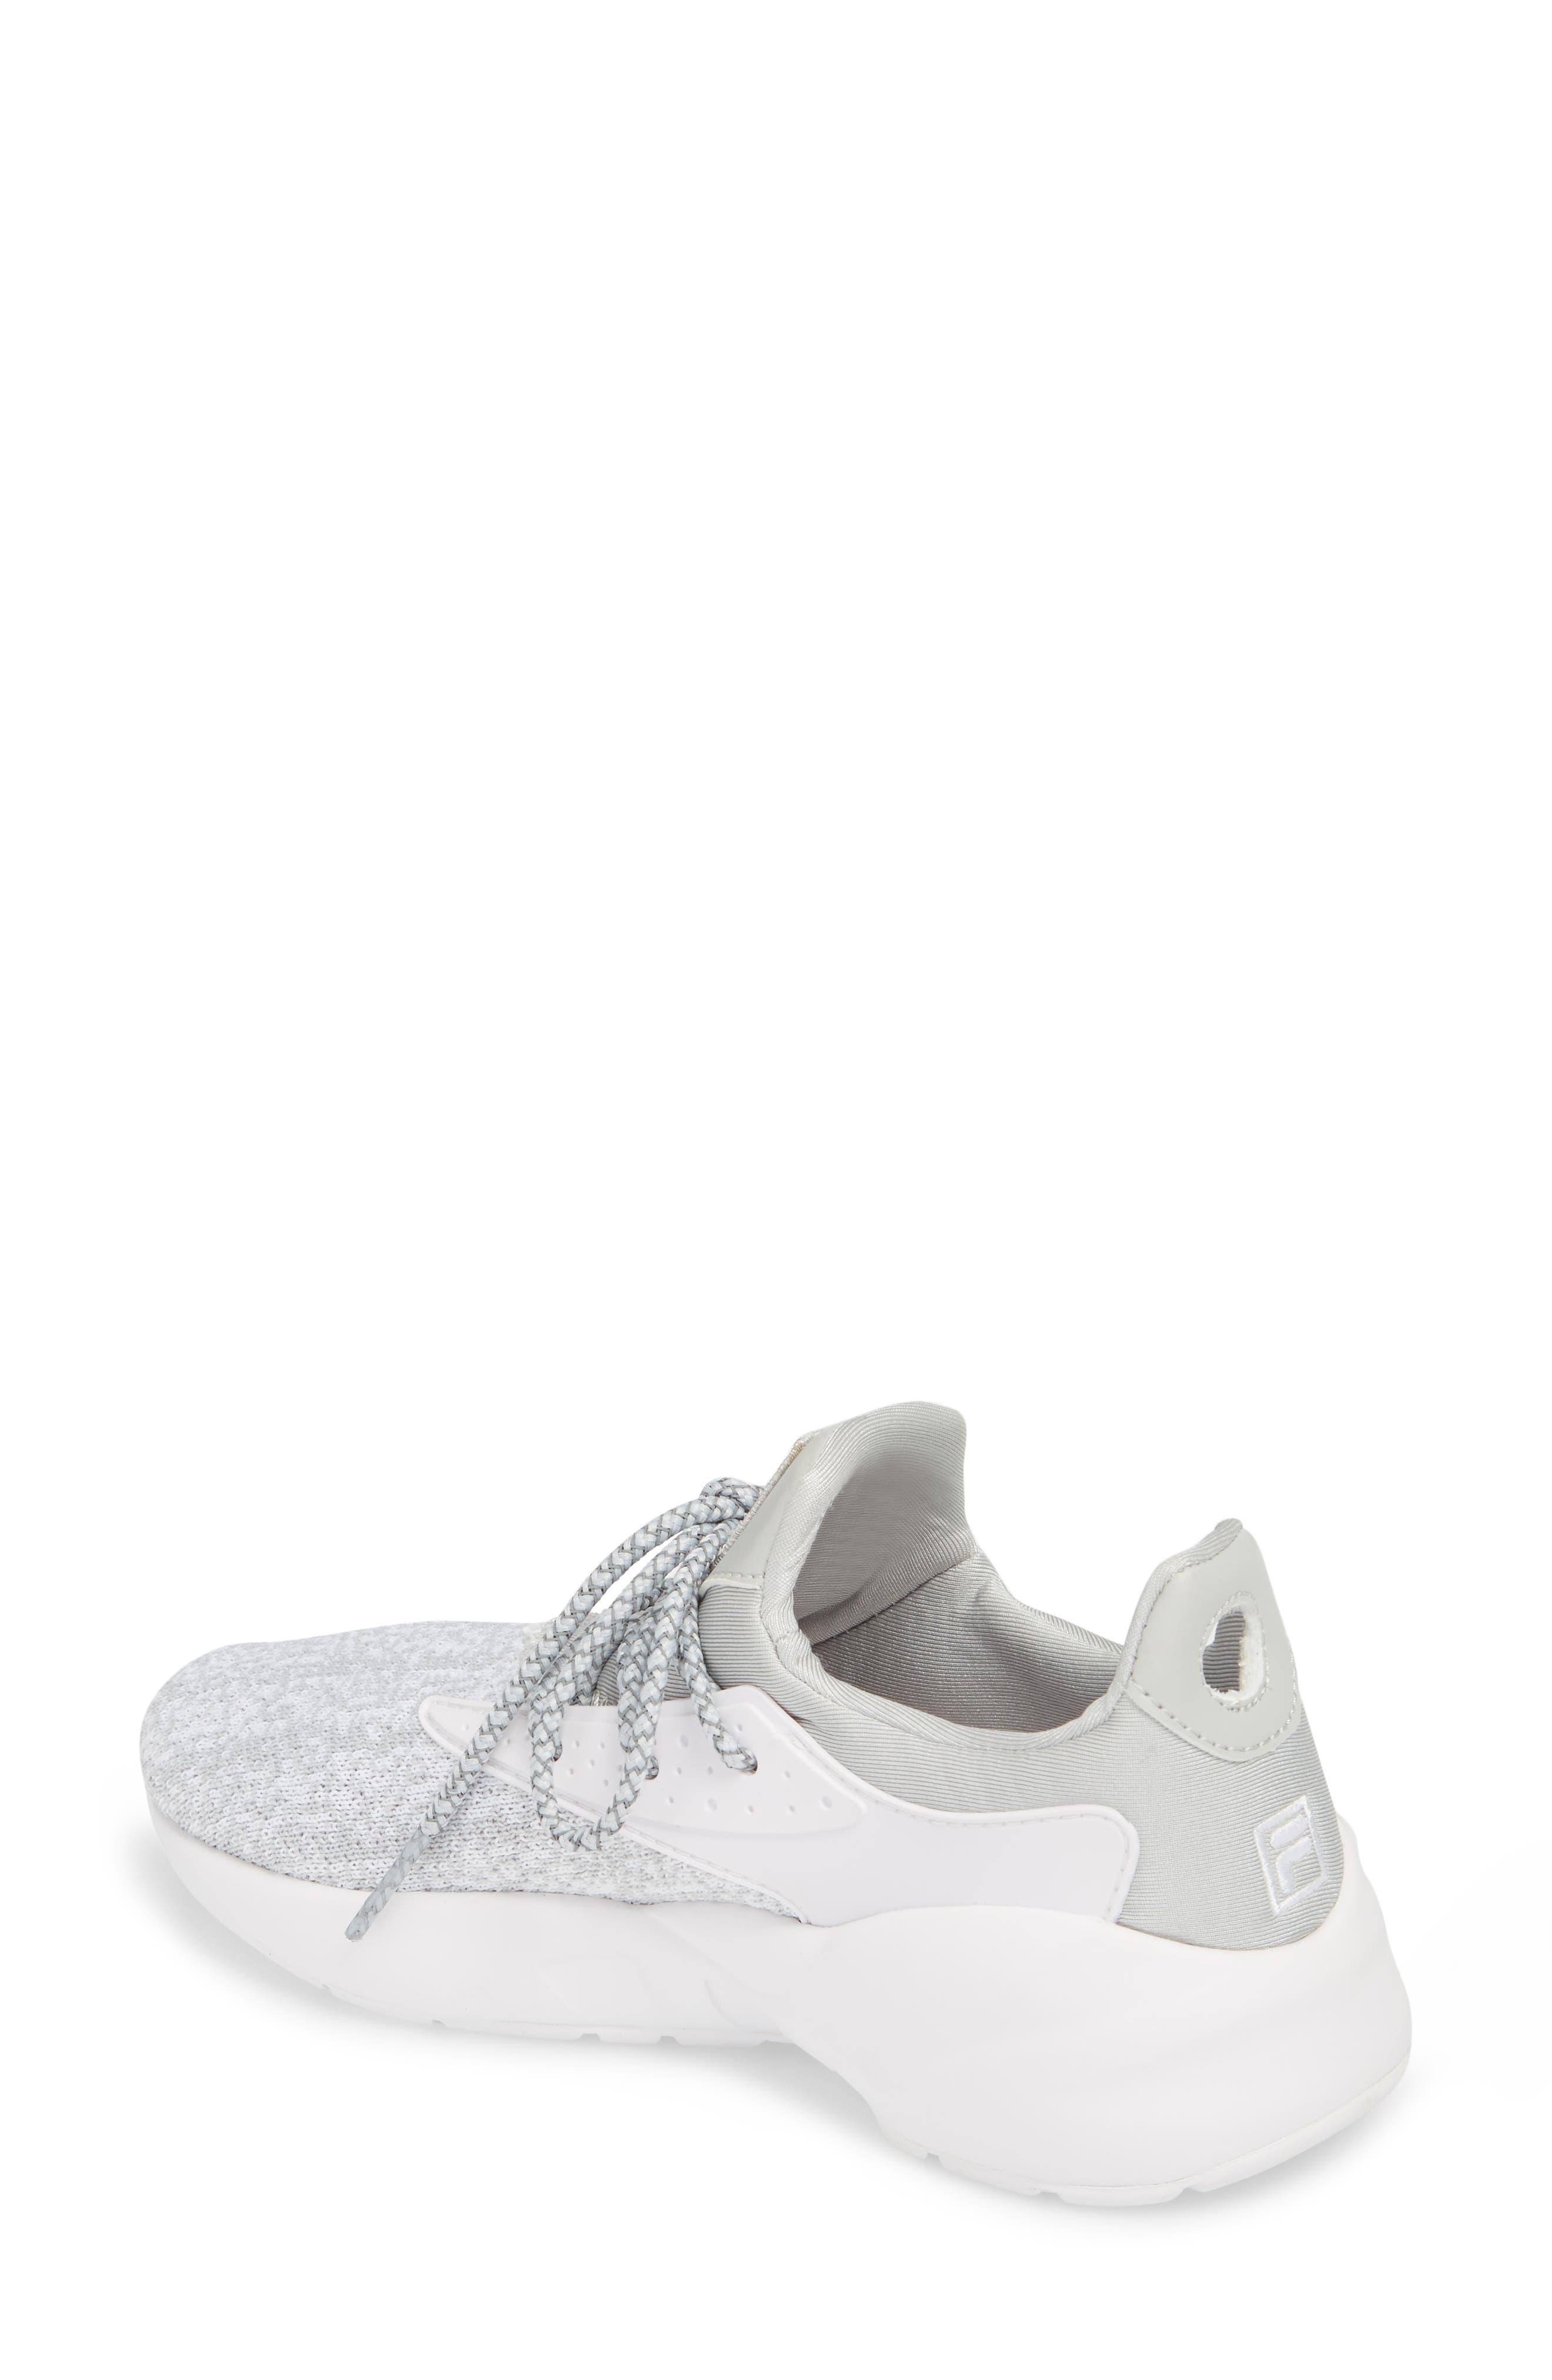 Mindbreaker 2.0 Sneaker,                             Alternate thumbnail 2, color,                             HIGHRISE/ WHITE/ CHALK PINK